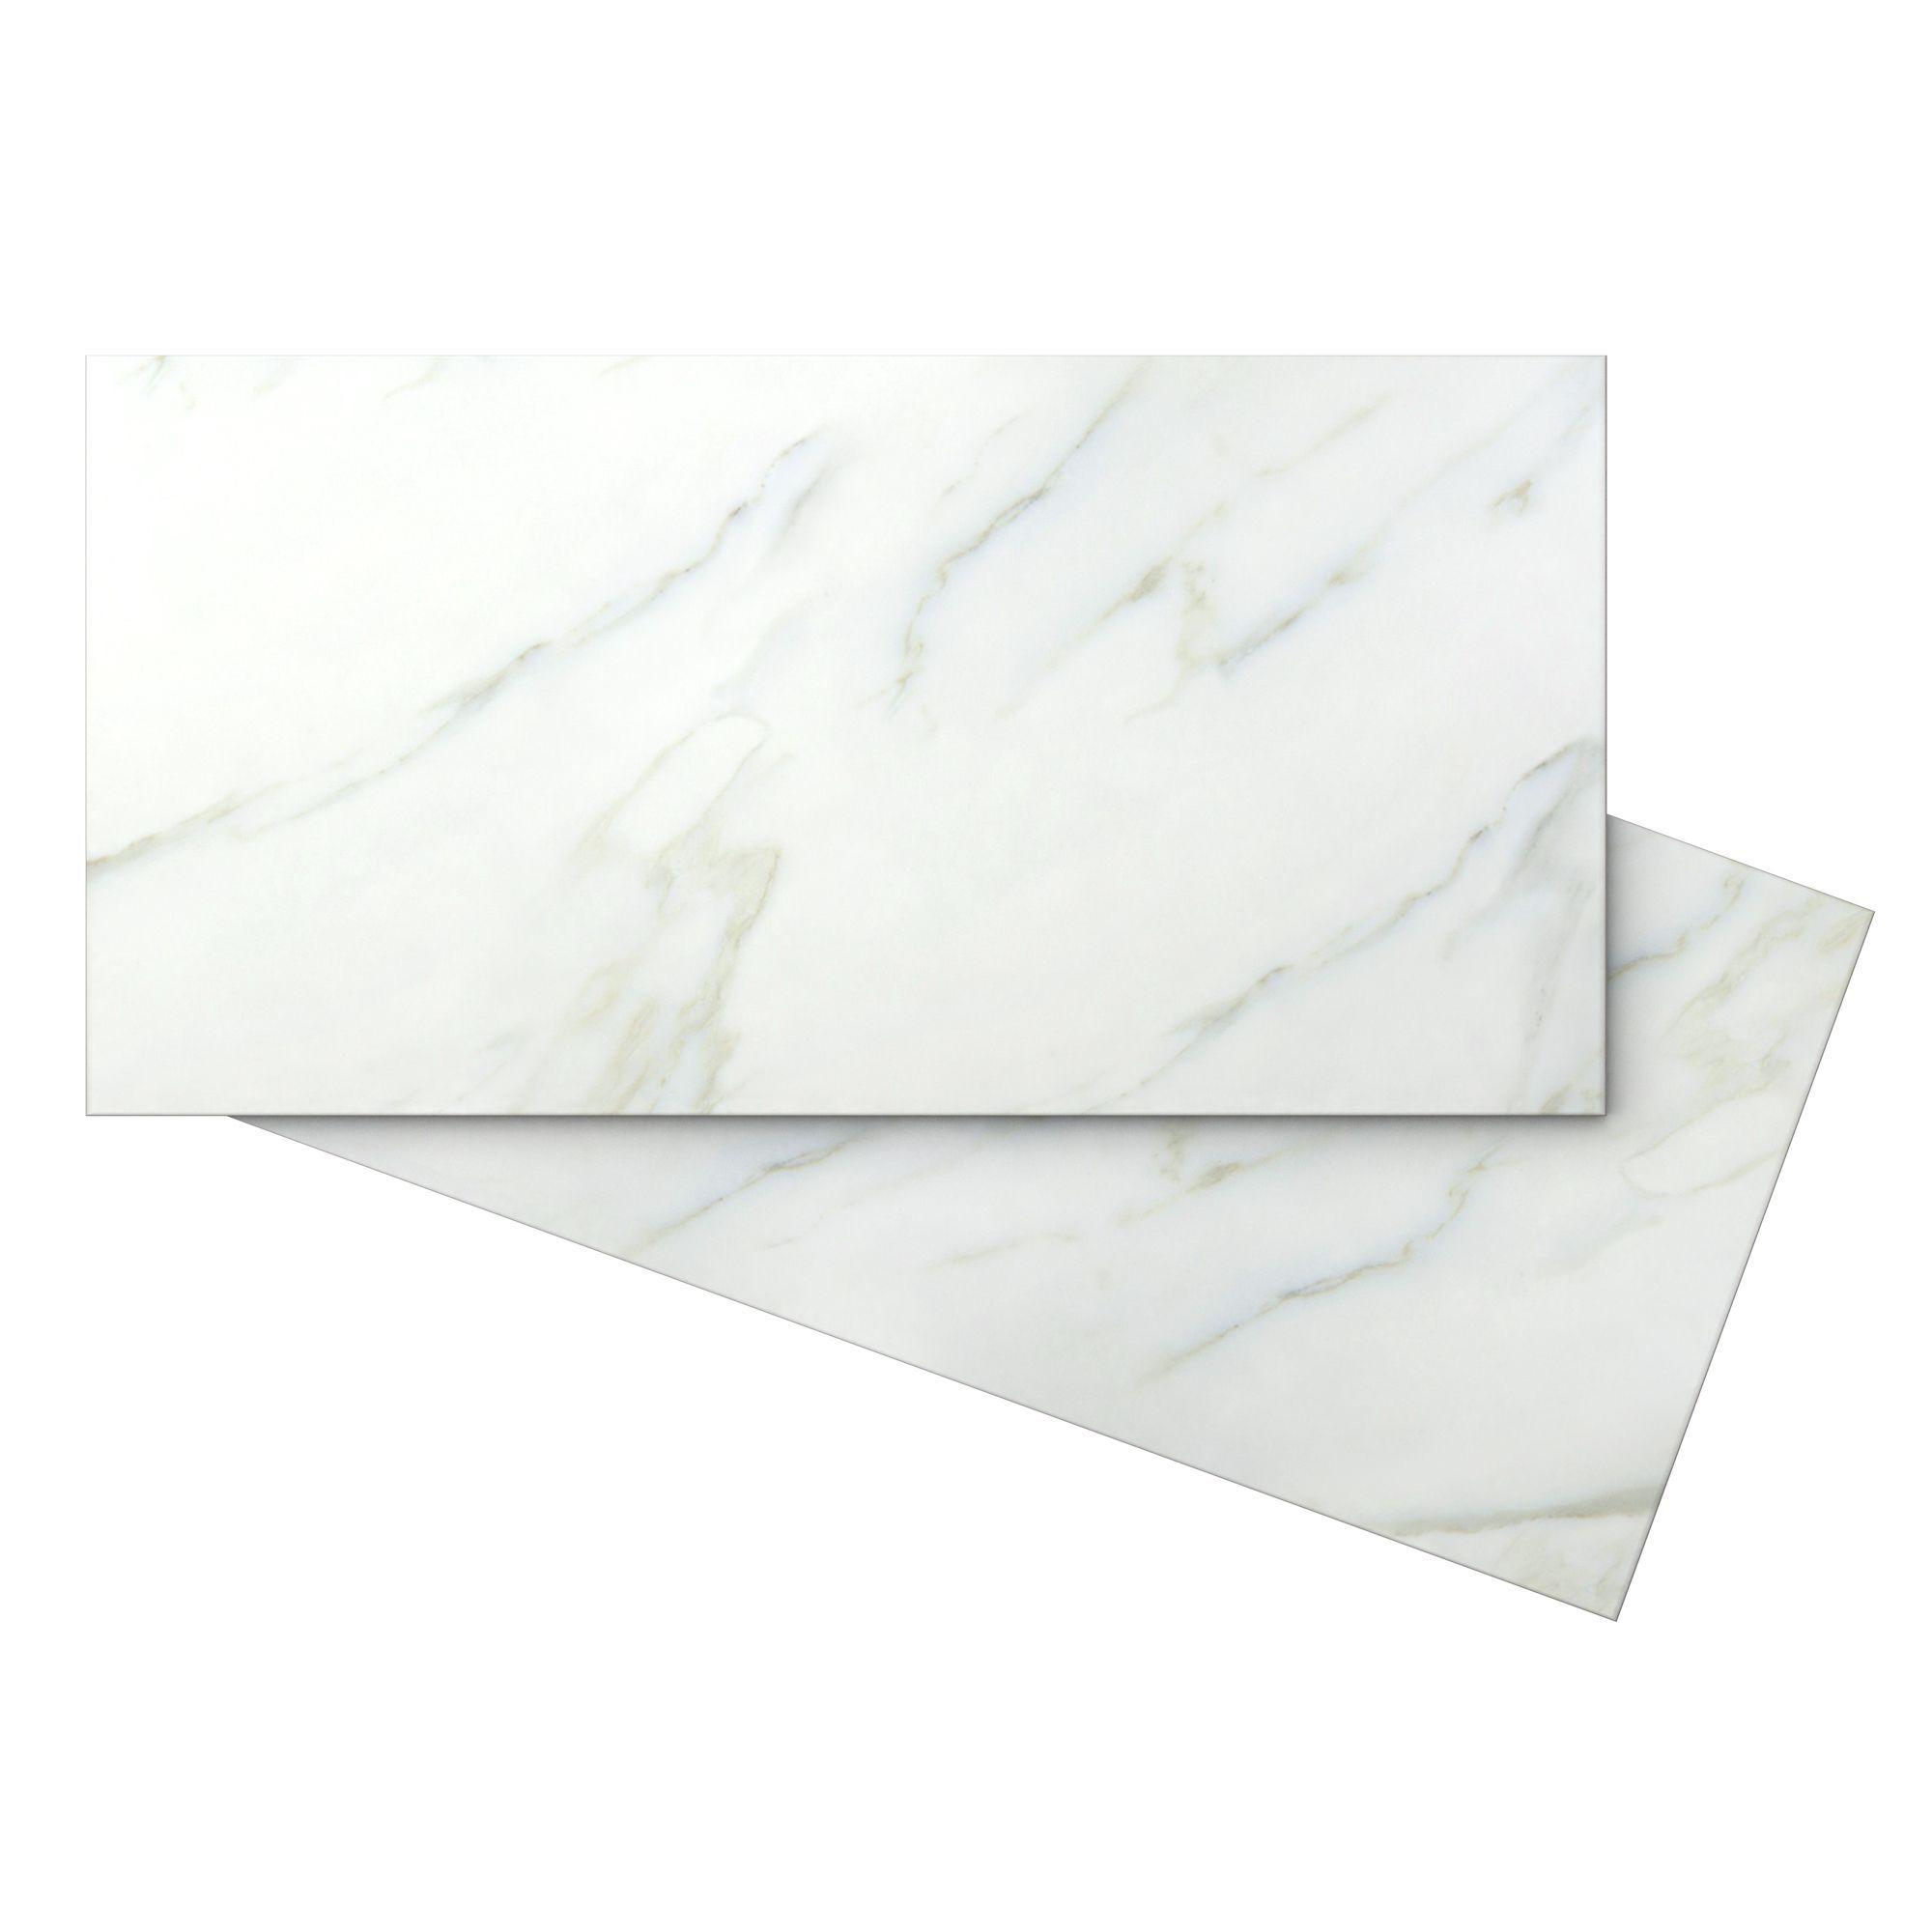 Aquila white stone effect carrara ceramic wall tile pack of 5 l aquila white stone effect carrara ceramic wall tile pack of 5 l600mm w300mm departments diy at bq dailygadgetfo Choice Image